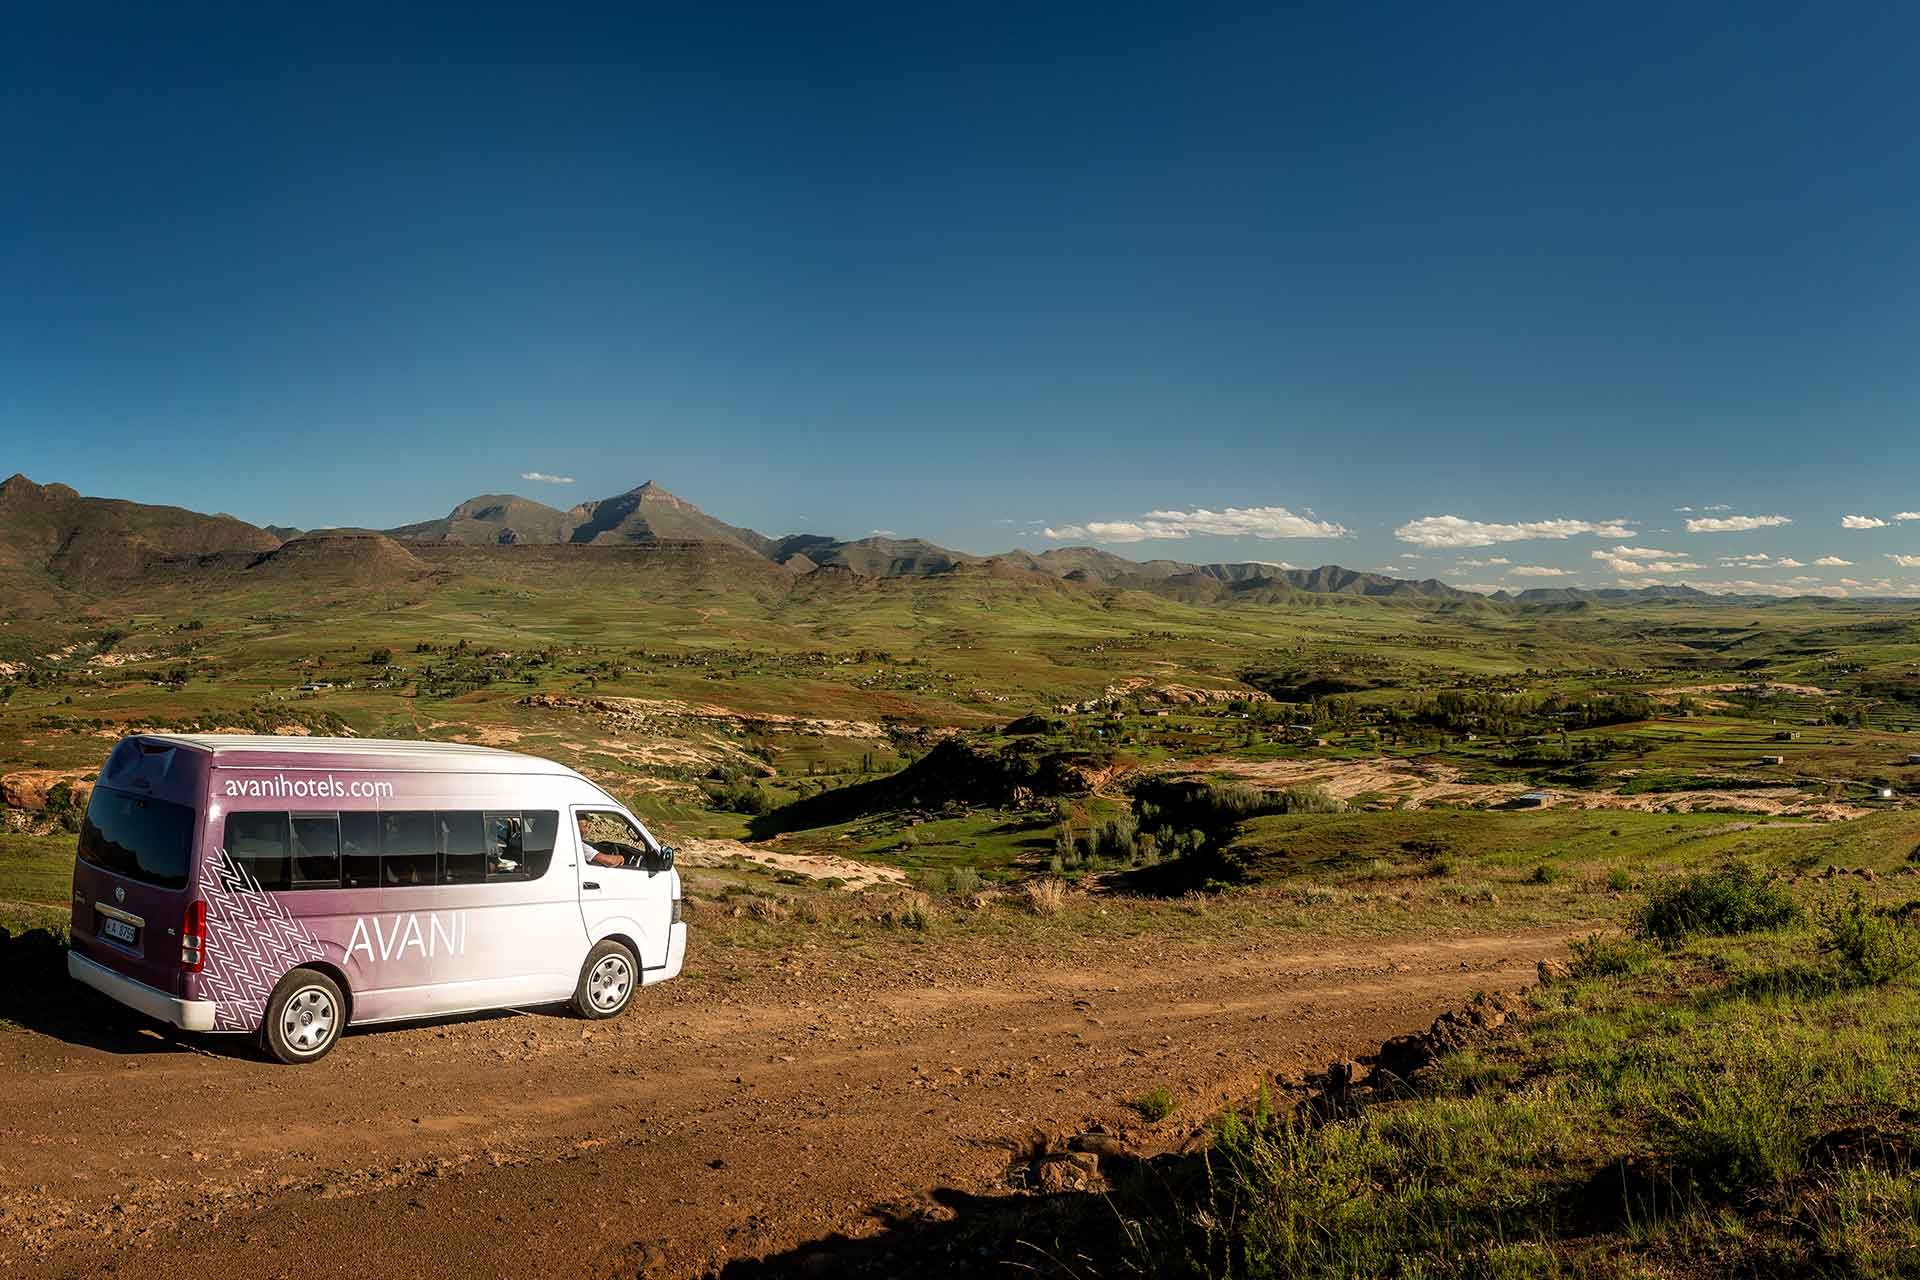 An AVANI van exploring Lesotho